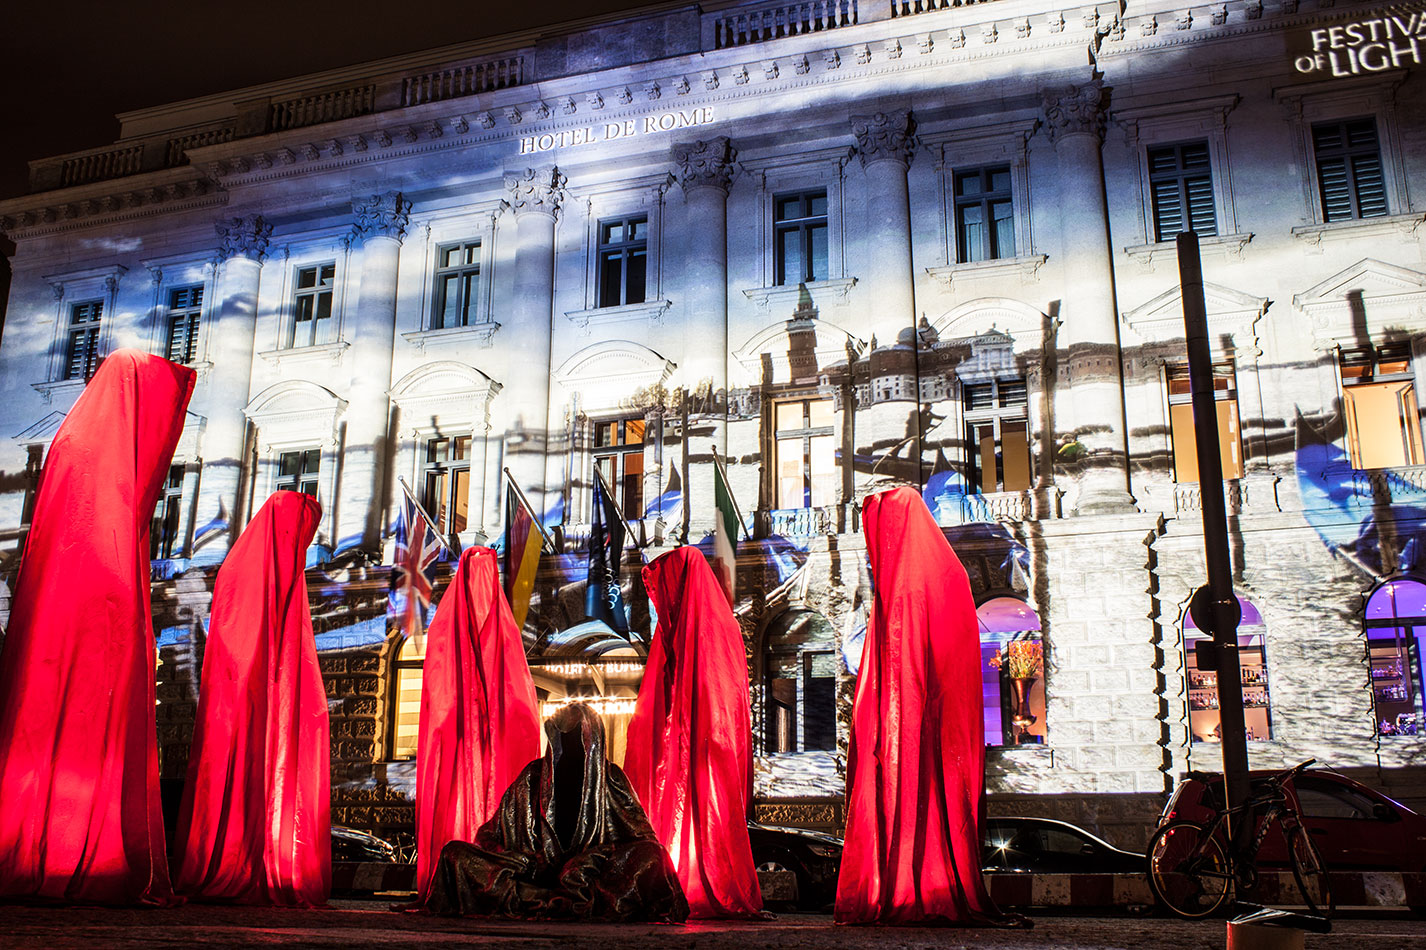 festival-of-lights-berlin-hotel-de-rome-light-art-show-exhibition-lumina-guardians-of-time-manfred-kili-kielnhofer-contemporary-arts-design-sculpture-3397